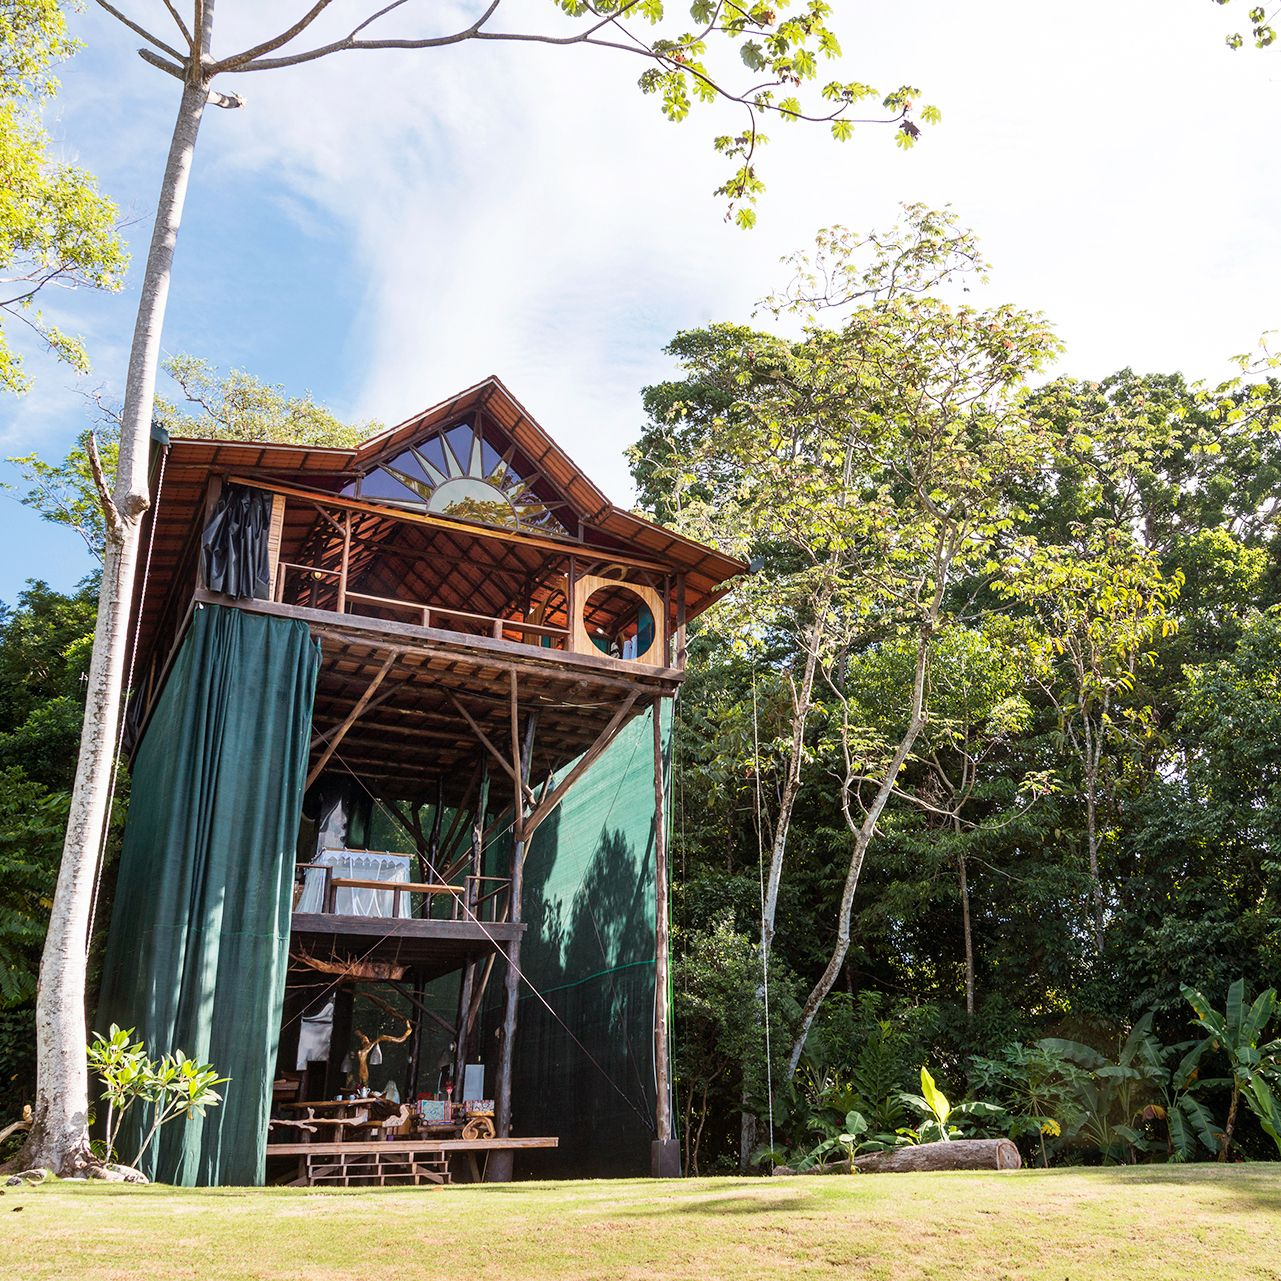 Osa Peninsula Costa Rica Hotels: A Treehouse In Osa Peninsula, Costa Rica, With Jungle And